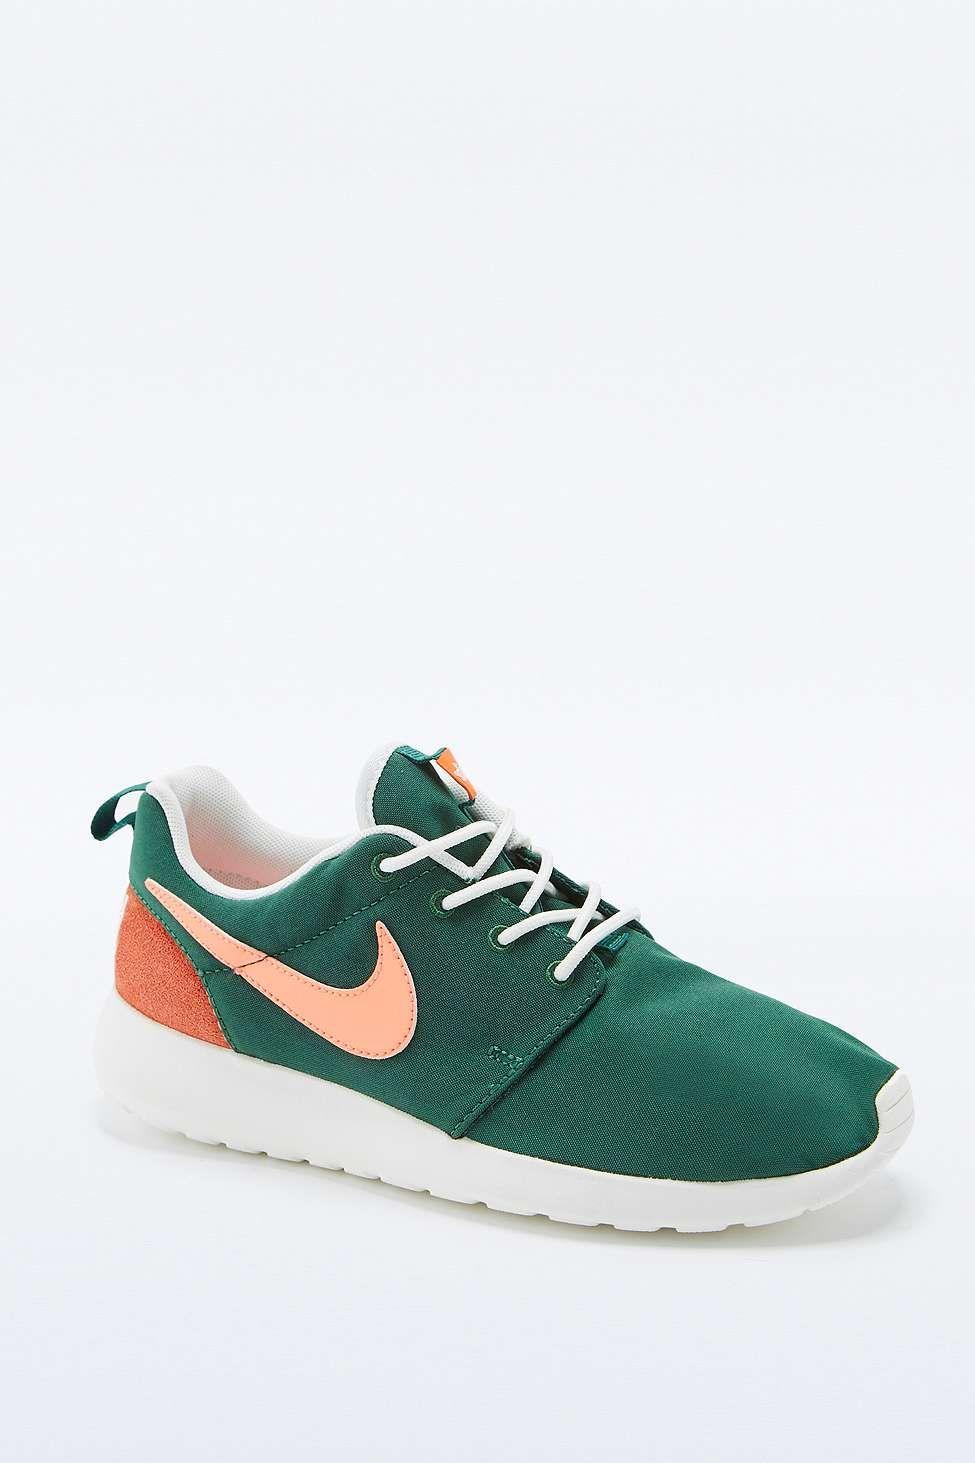 be7256ecc5bb ... Nike Roshe Run Retro Green Trainers ...